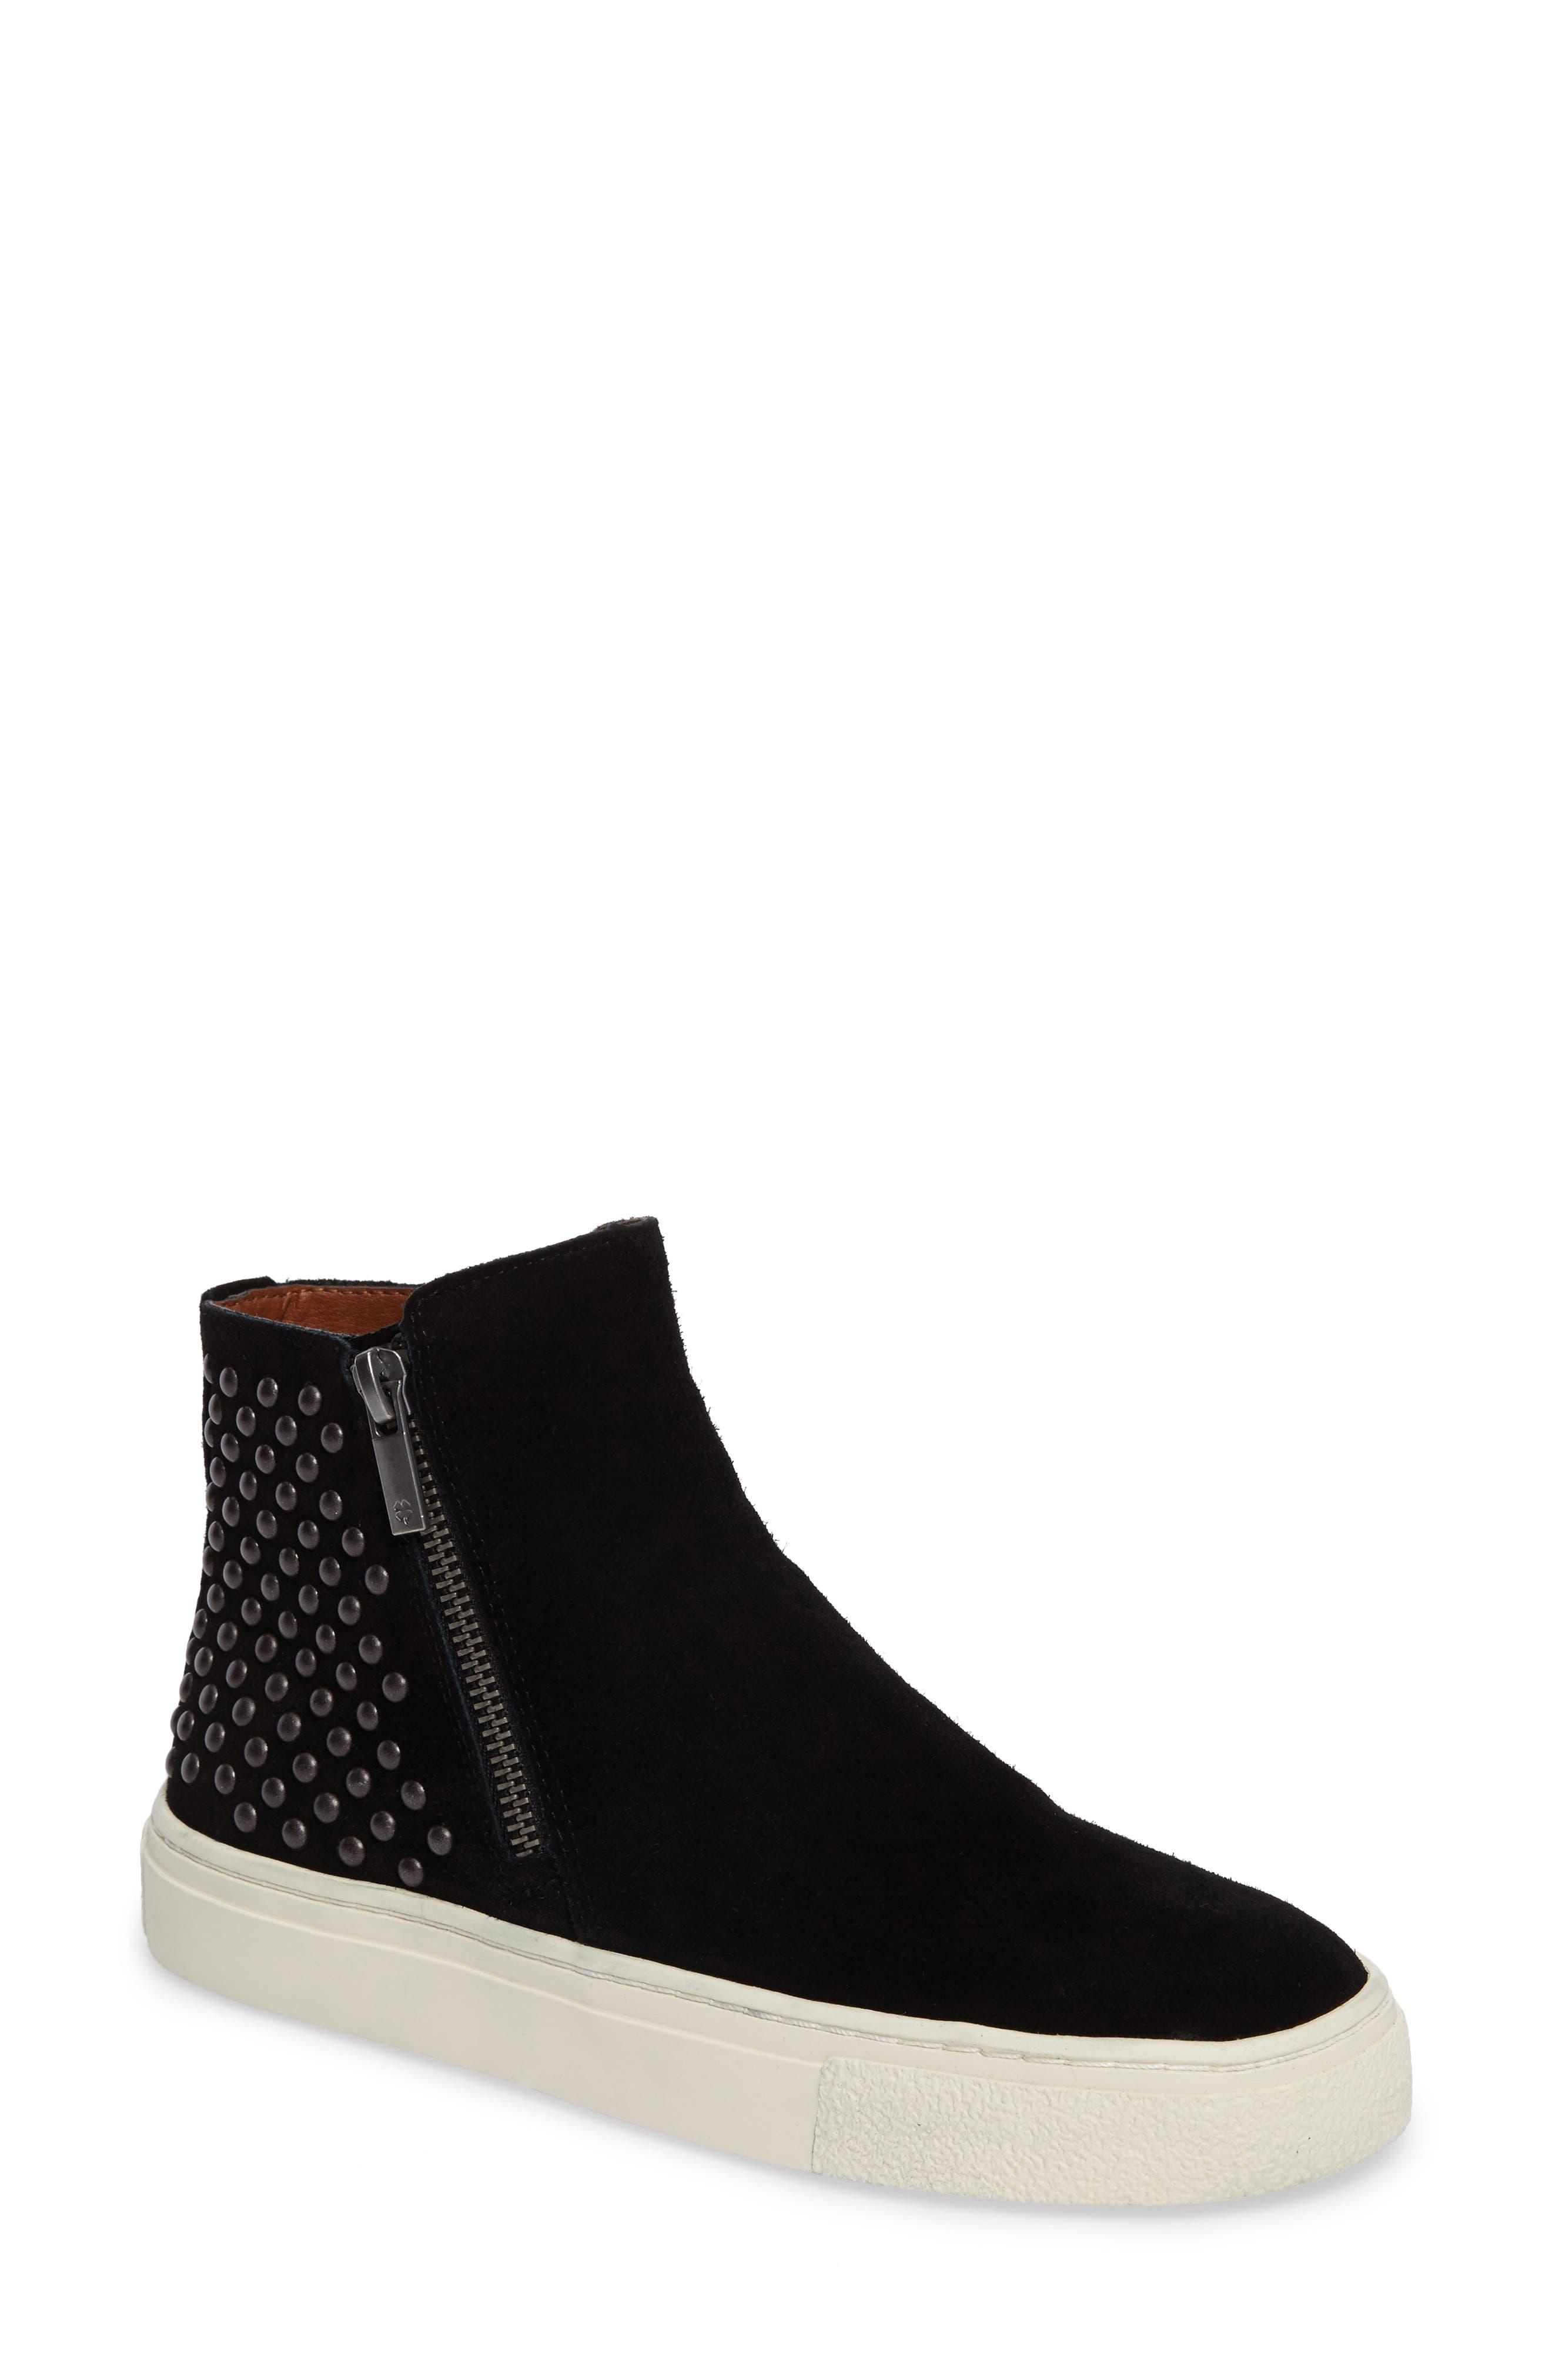 Bayleah High Top Sneaker,                         Main,                         color, Black Suede